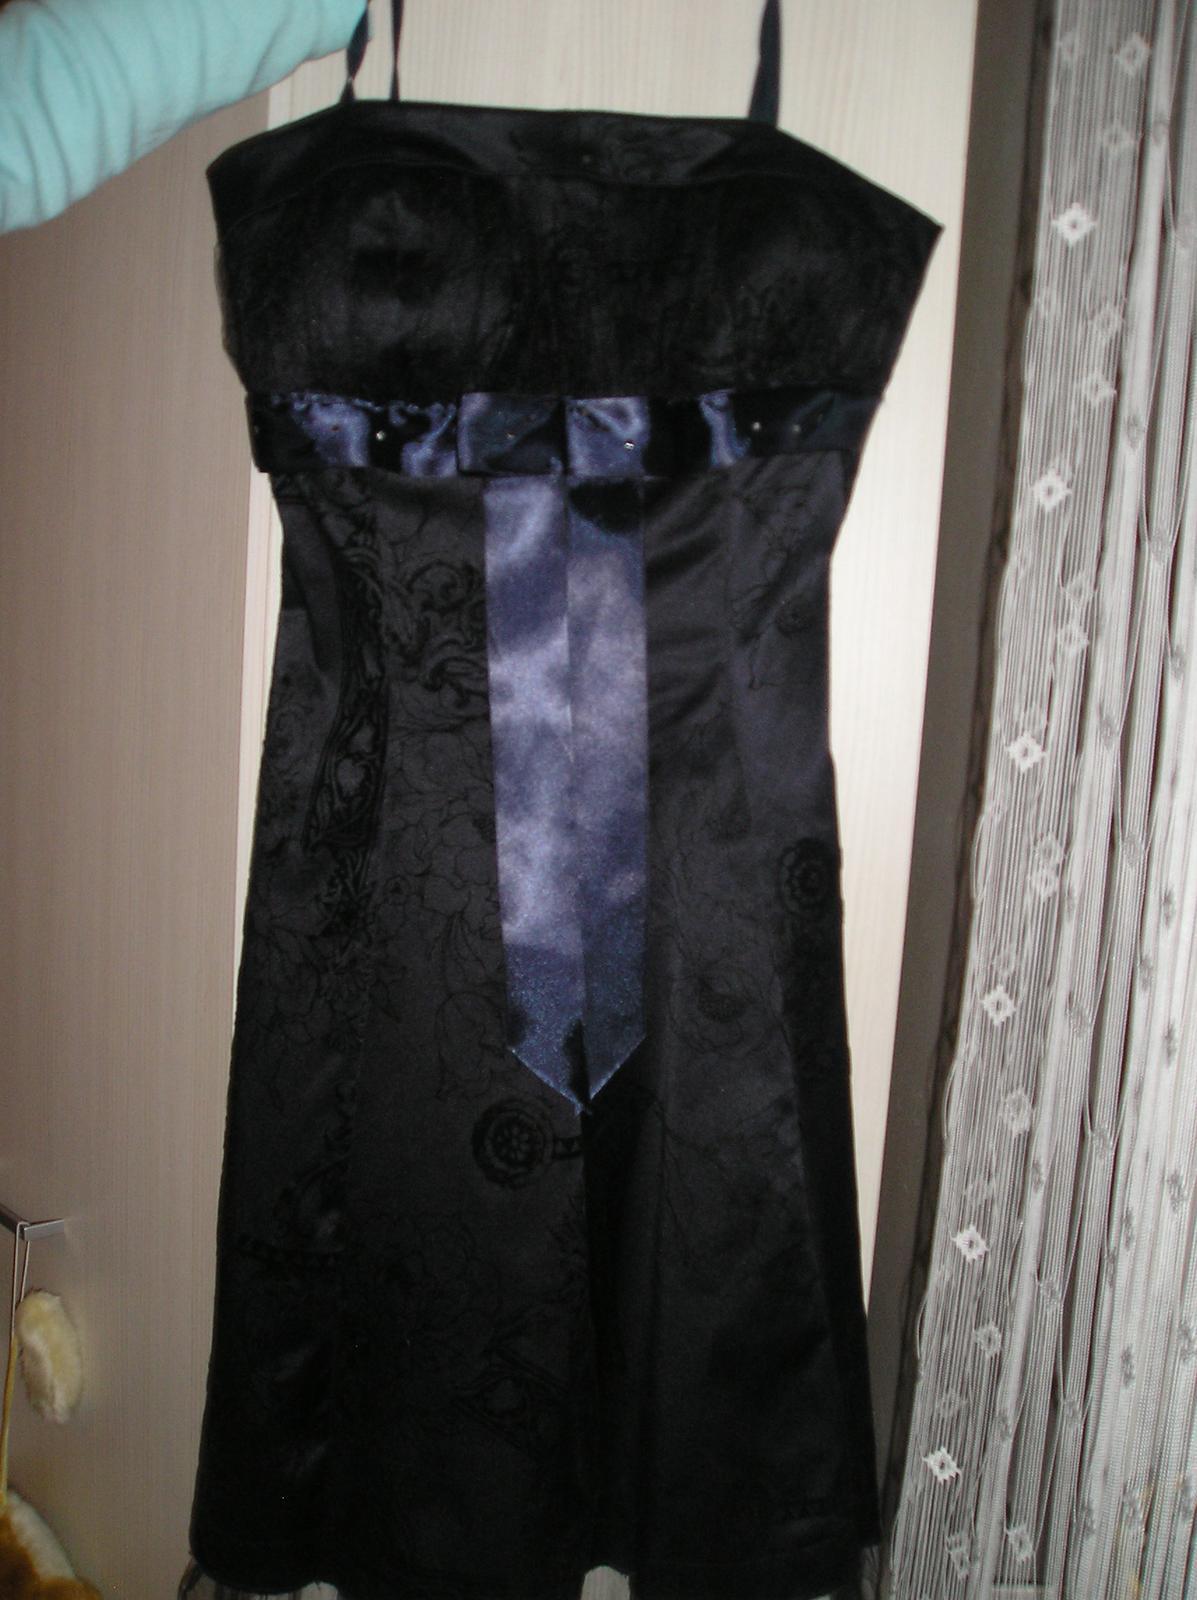 Tmavomodré krátke šaty - Obrázok č. 1